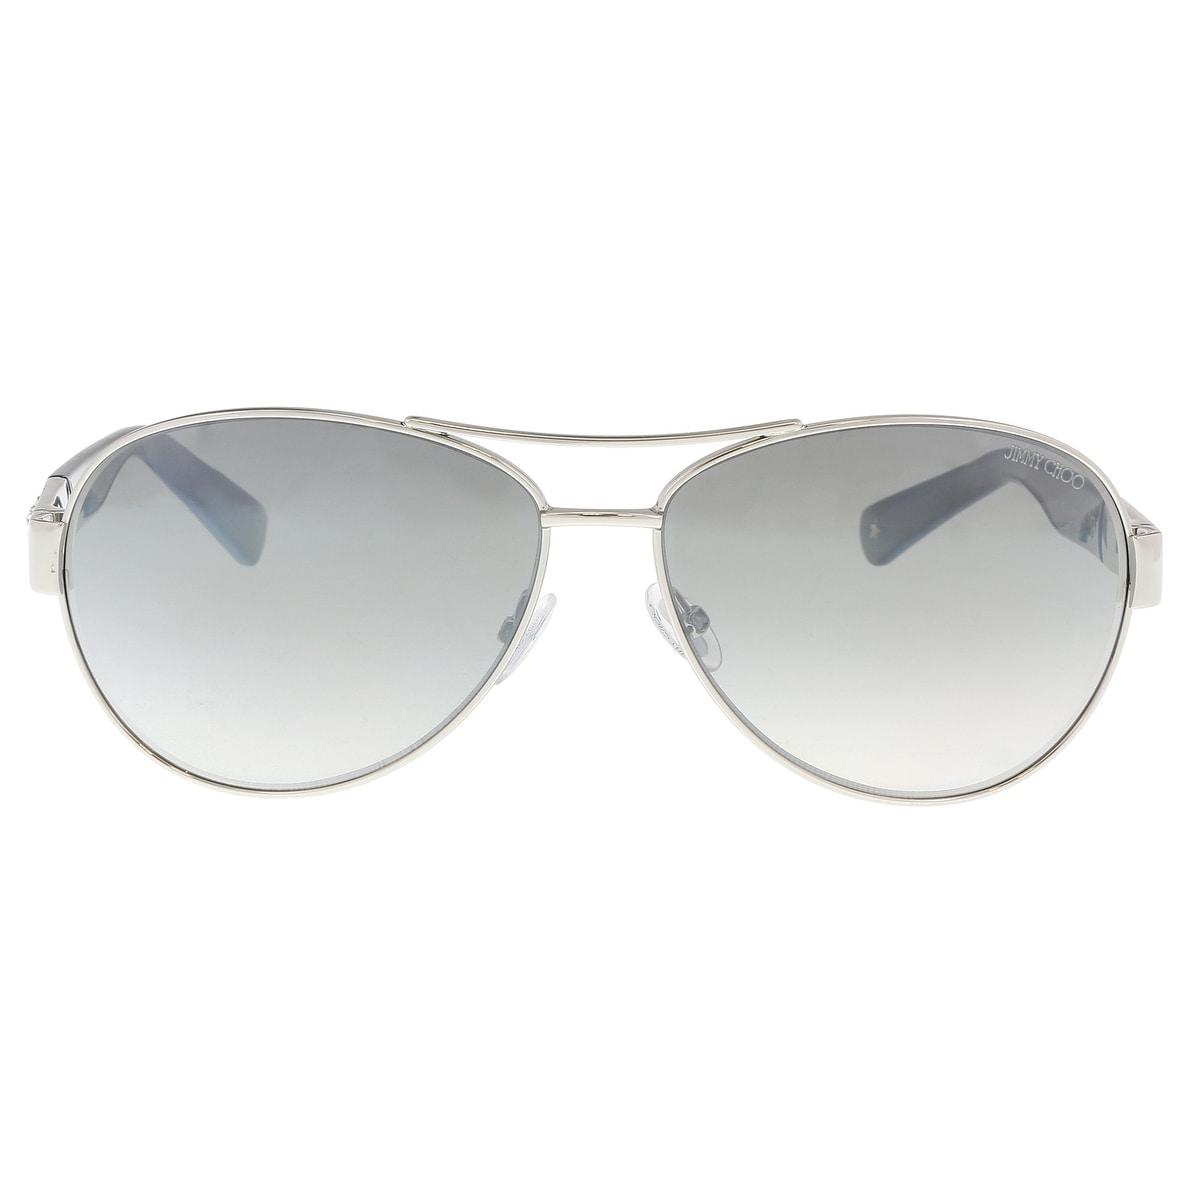 55570ca95c Shop Jimmy Choo BABA S 0RZS Palladium Grey Aviator Sunglasses - 59-13-135 -  Free Shipping Today - Overstock - 21158314